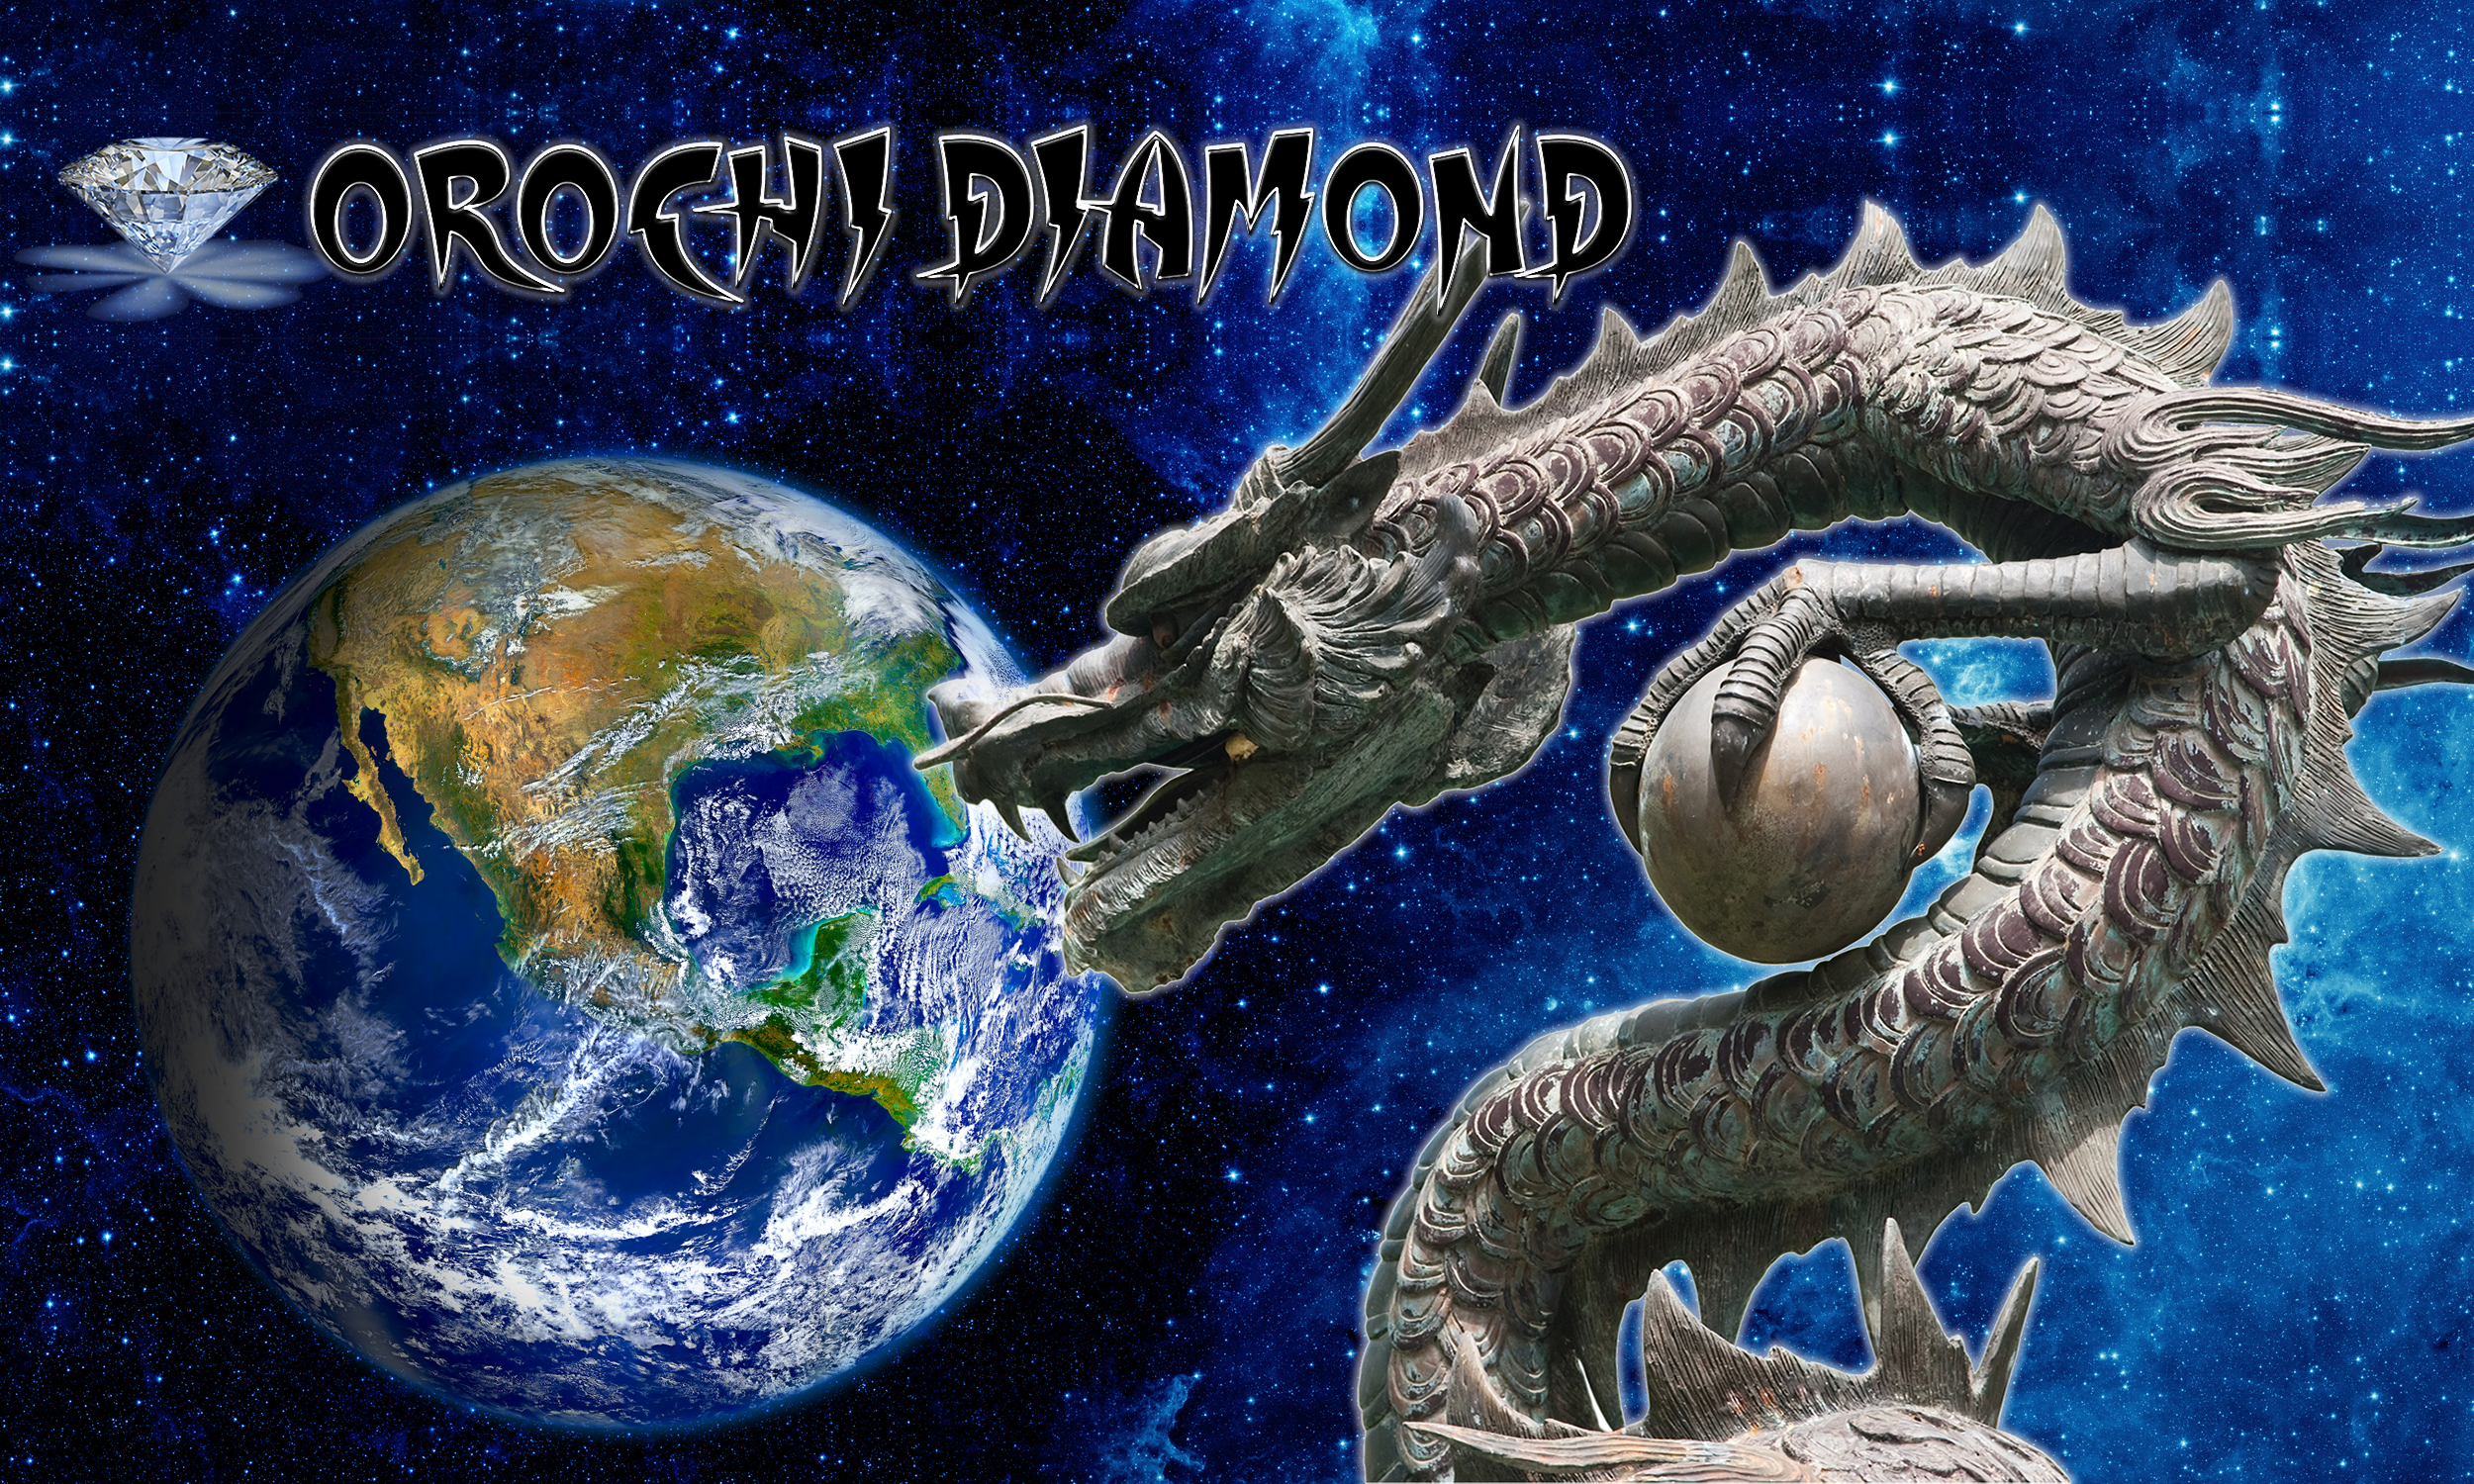 http://orochitool.com/diamond/img/header.png